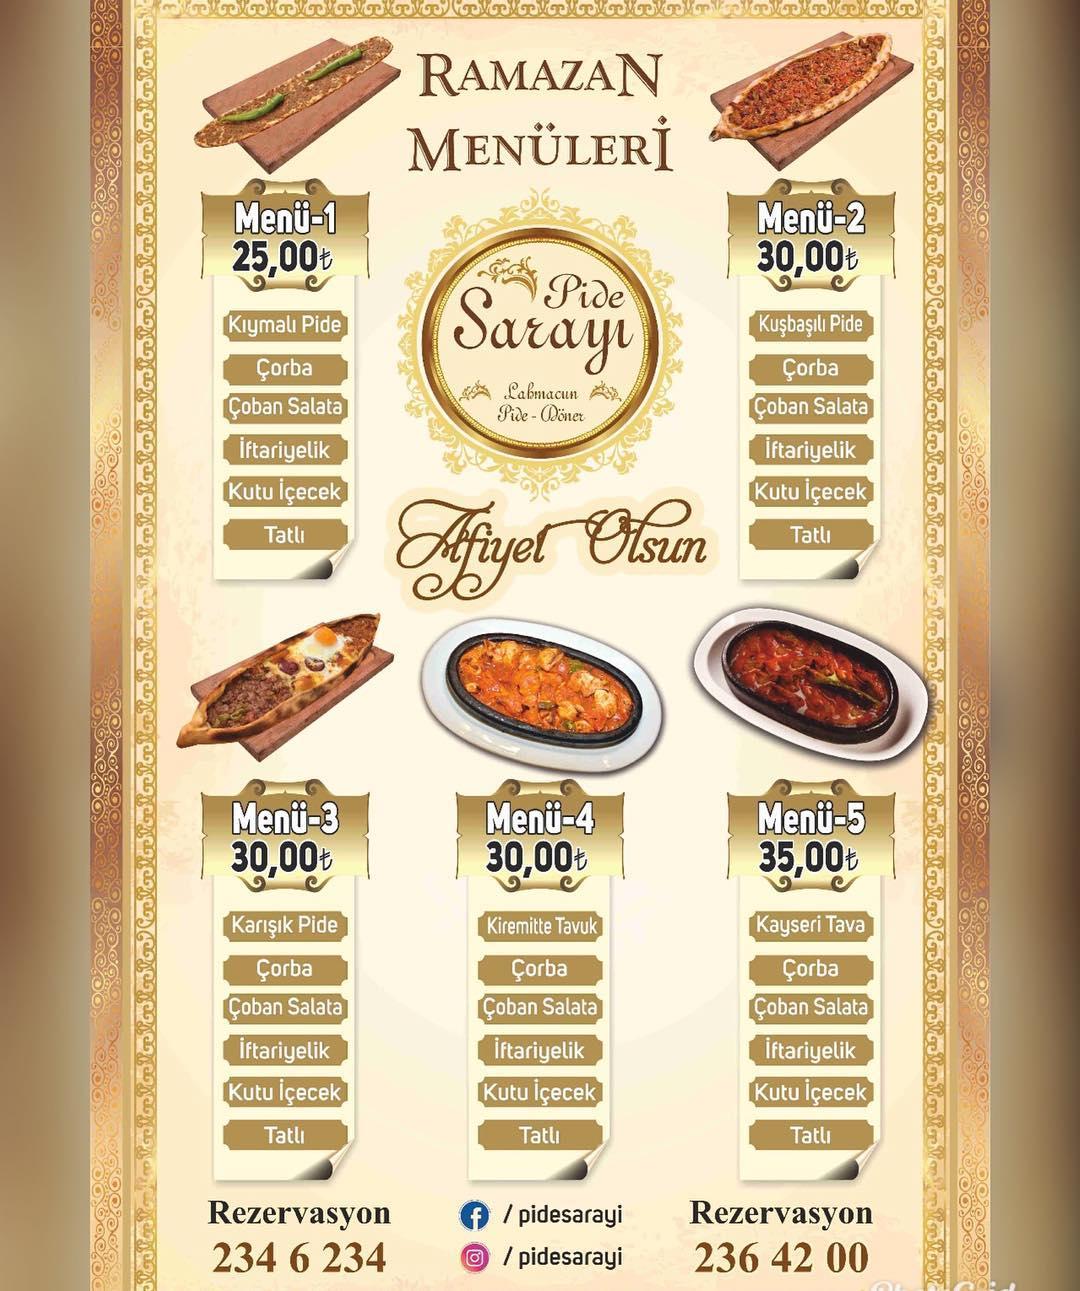 pide sarayı erciyesevler kayseri iftar